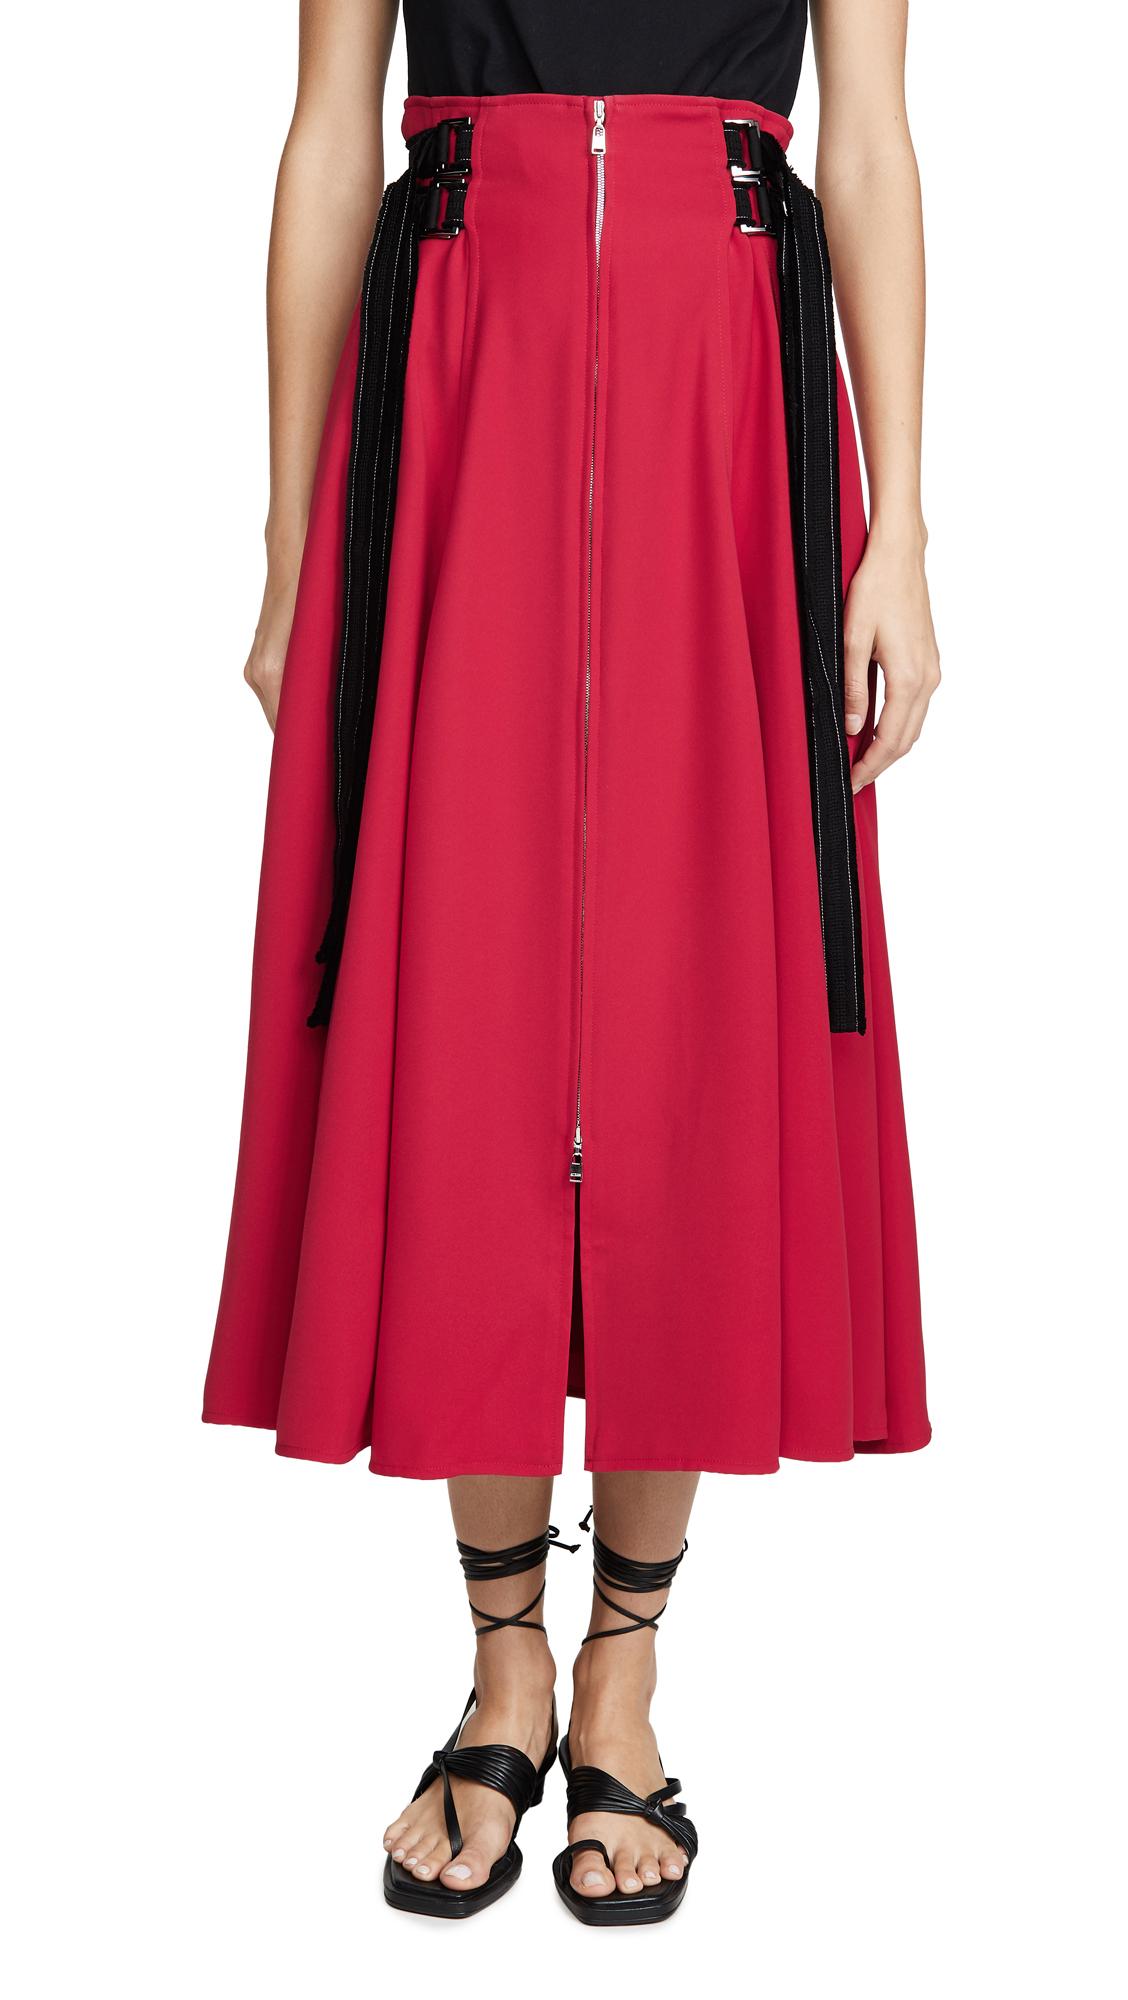 Adeam Zip Up Skirt - Scarlet